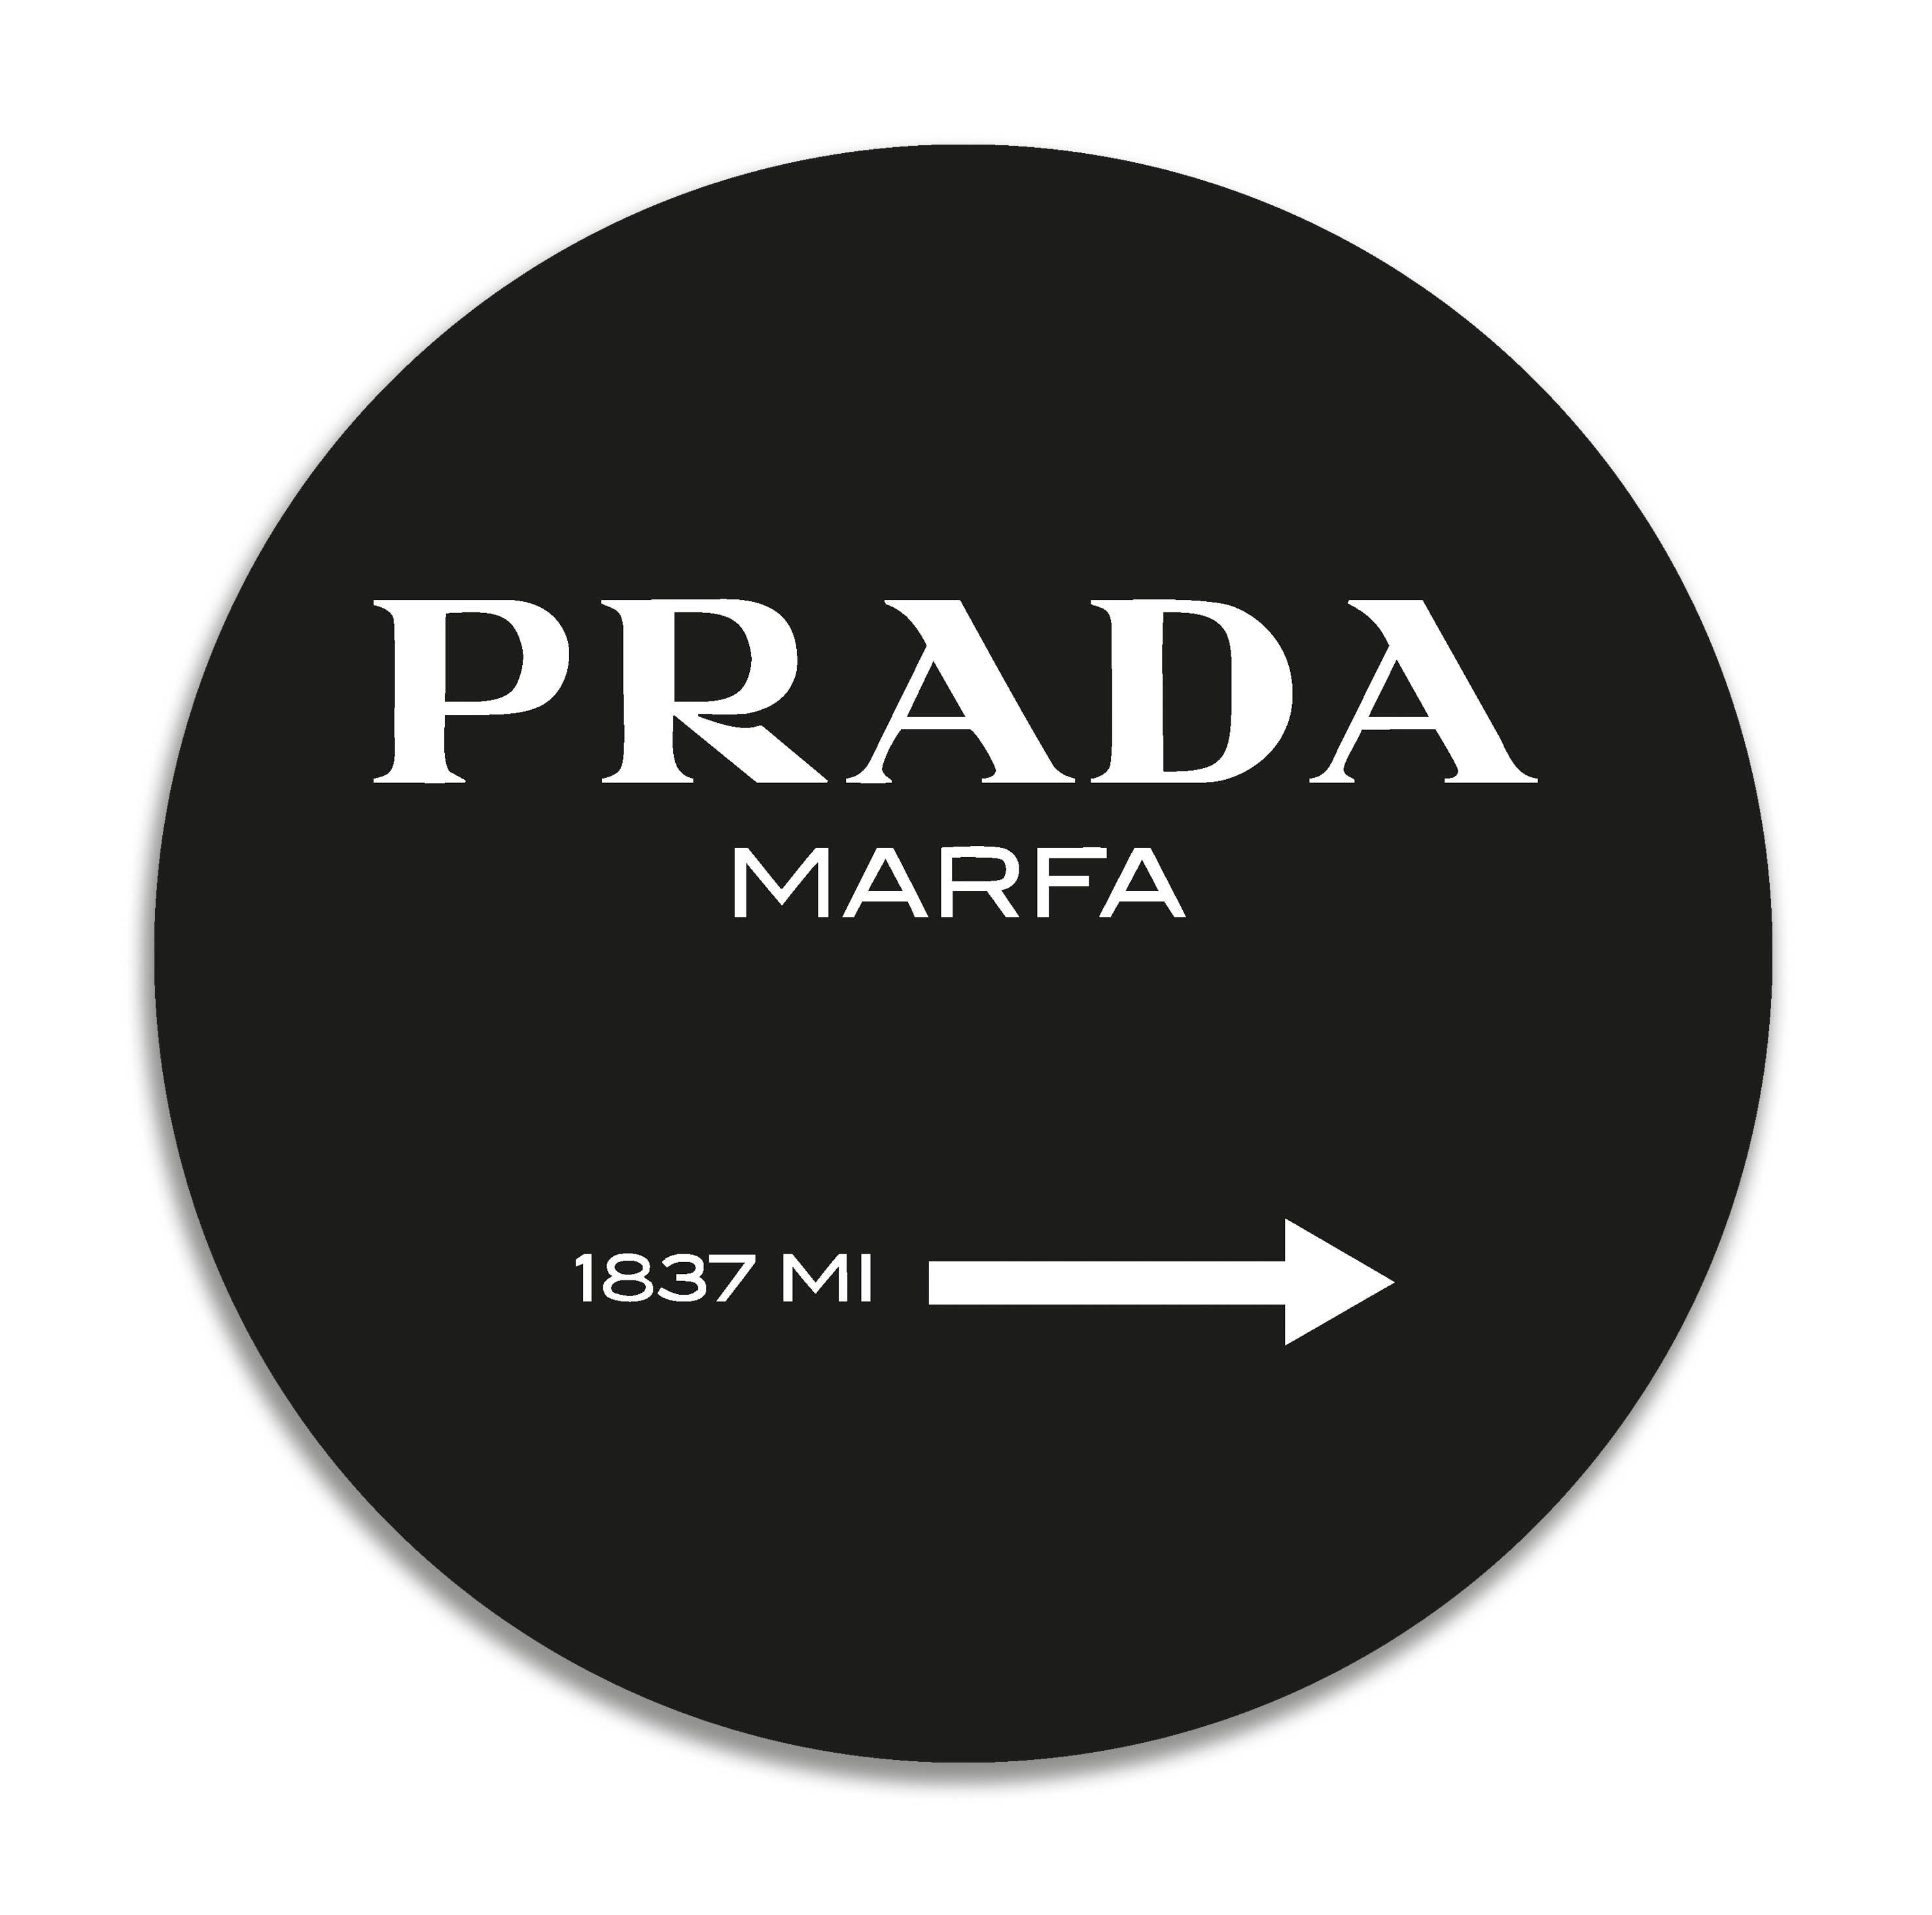 Panorama Alfombra Vinílica Prada Marfa Redonda - Alfombra Cocina Vinilo - Alfombra Salón Antideslizante, Antihongos e Ignífuga